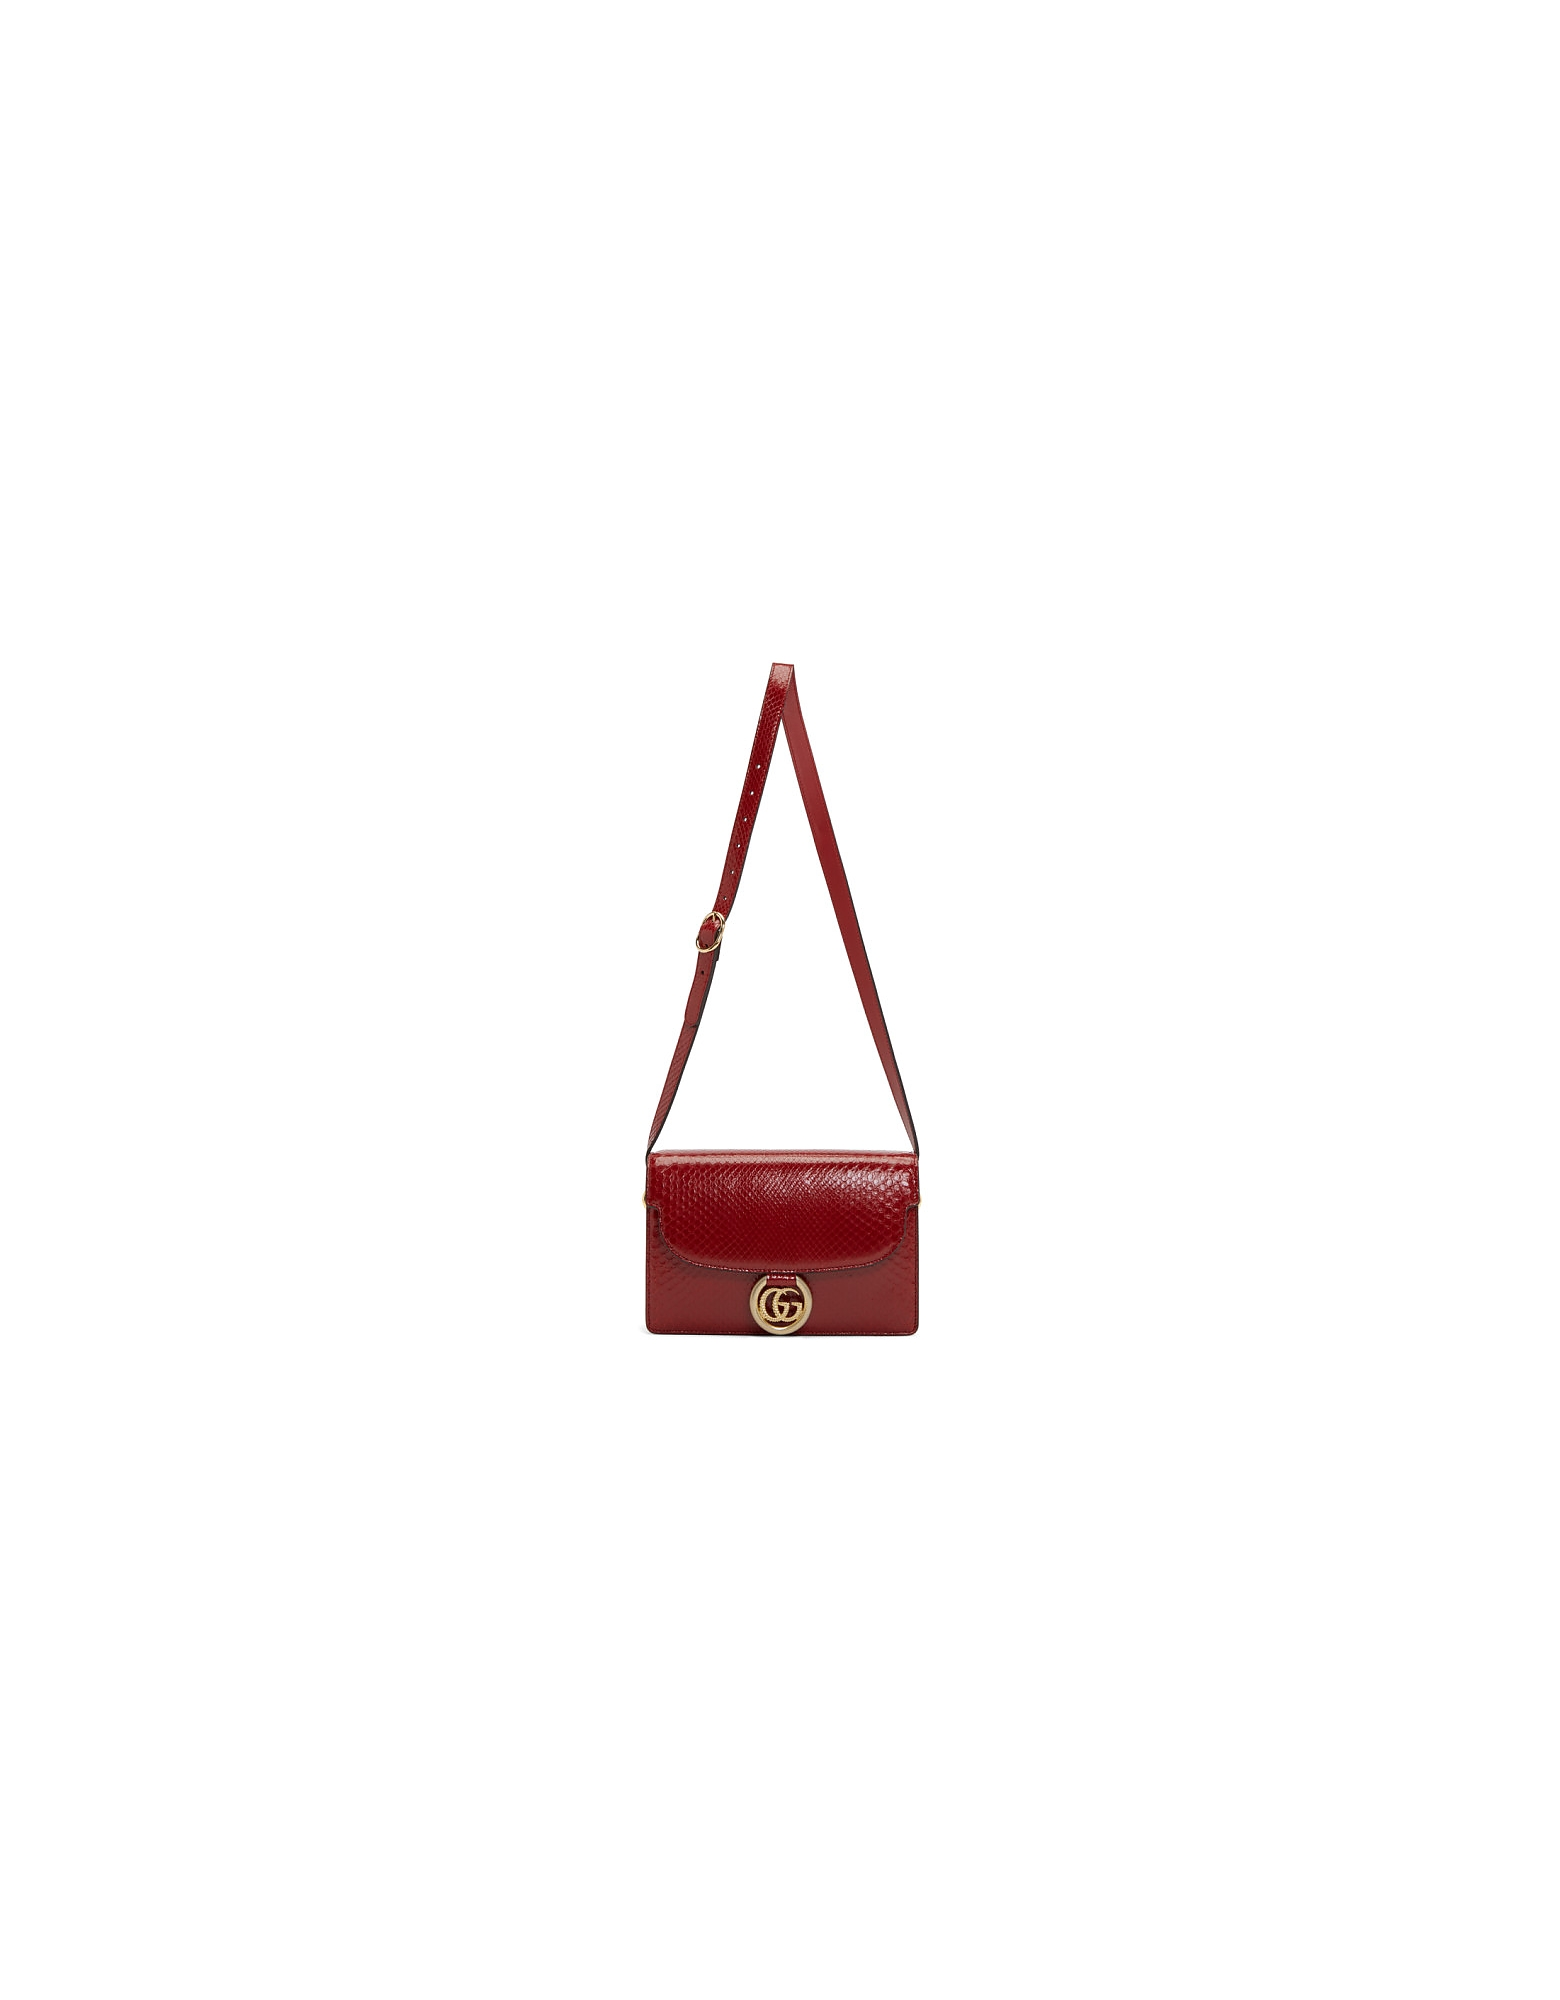 Gucci Designer Handbags, Red Small Snake GG Ring Bag